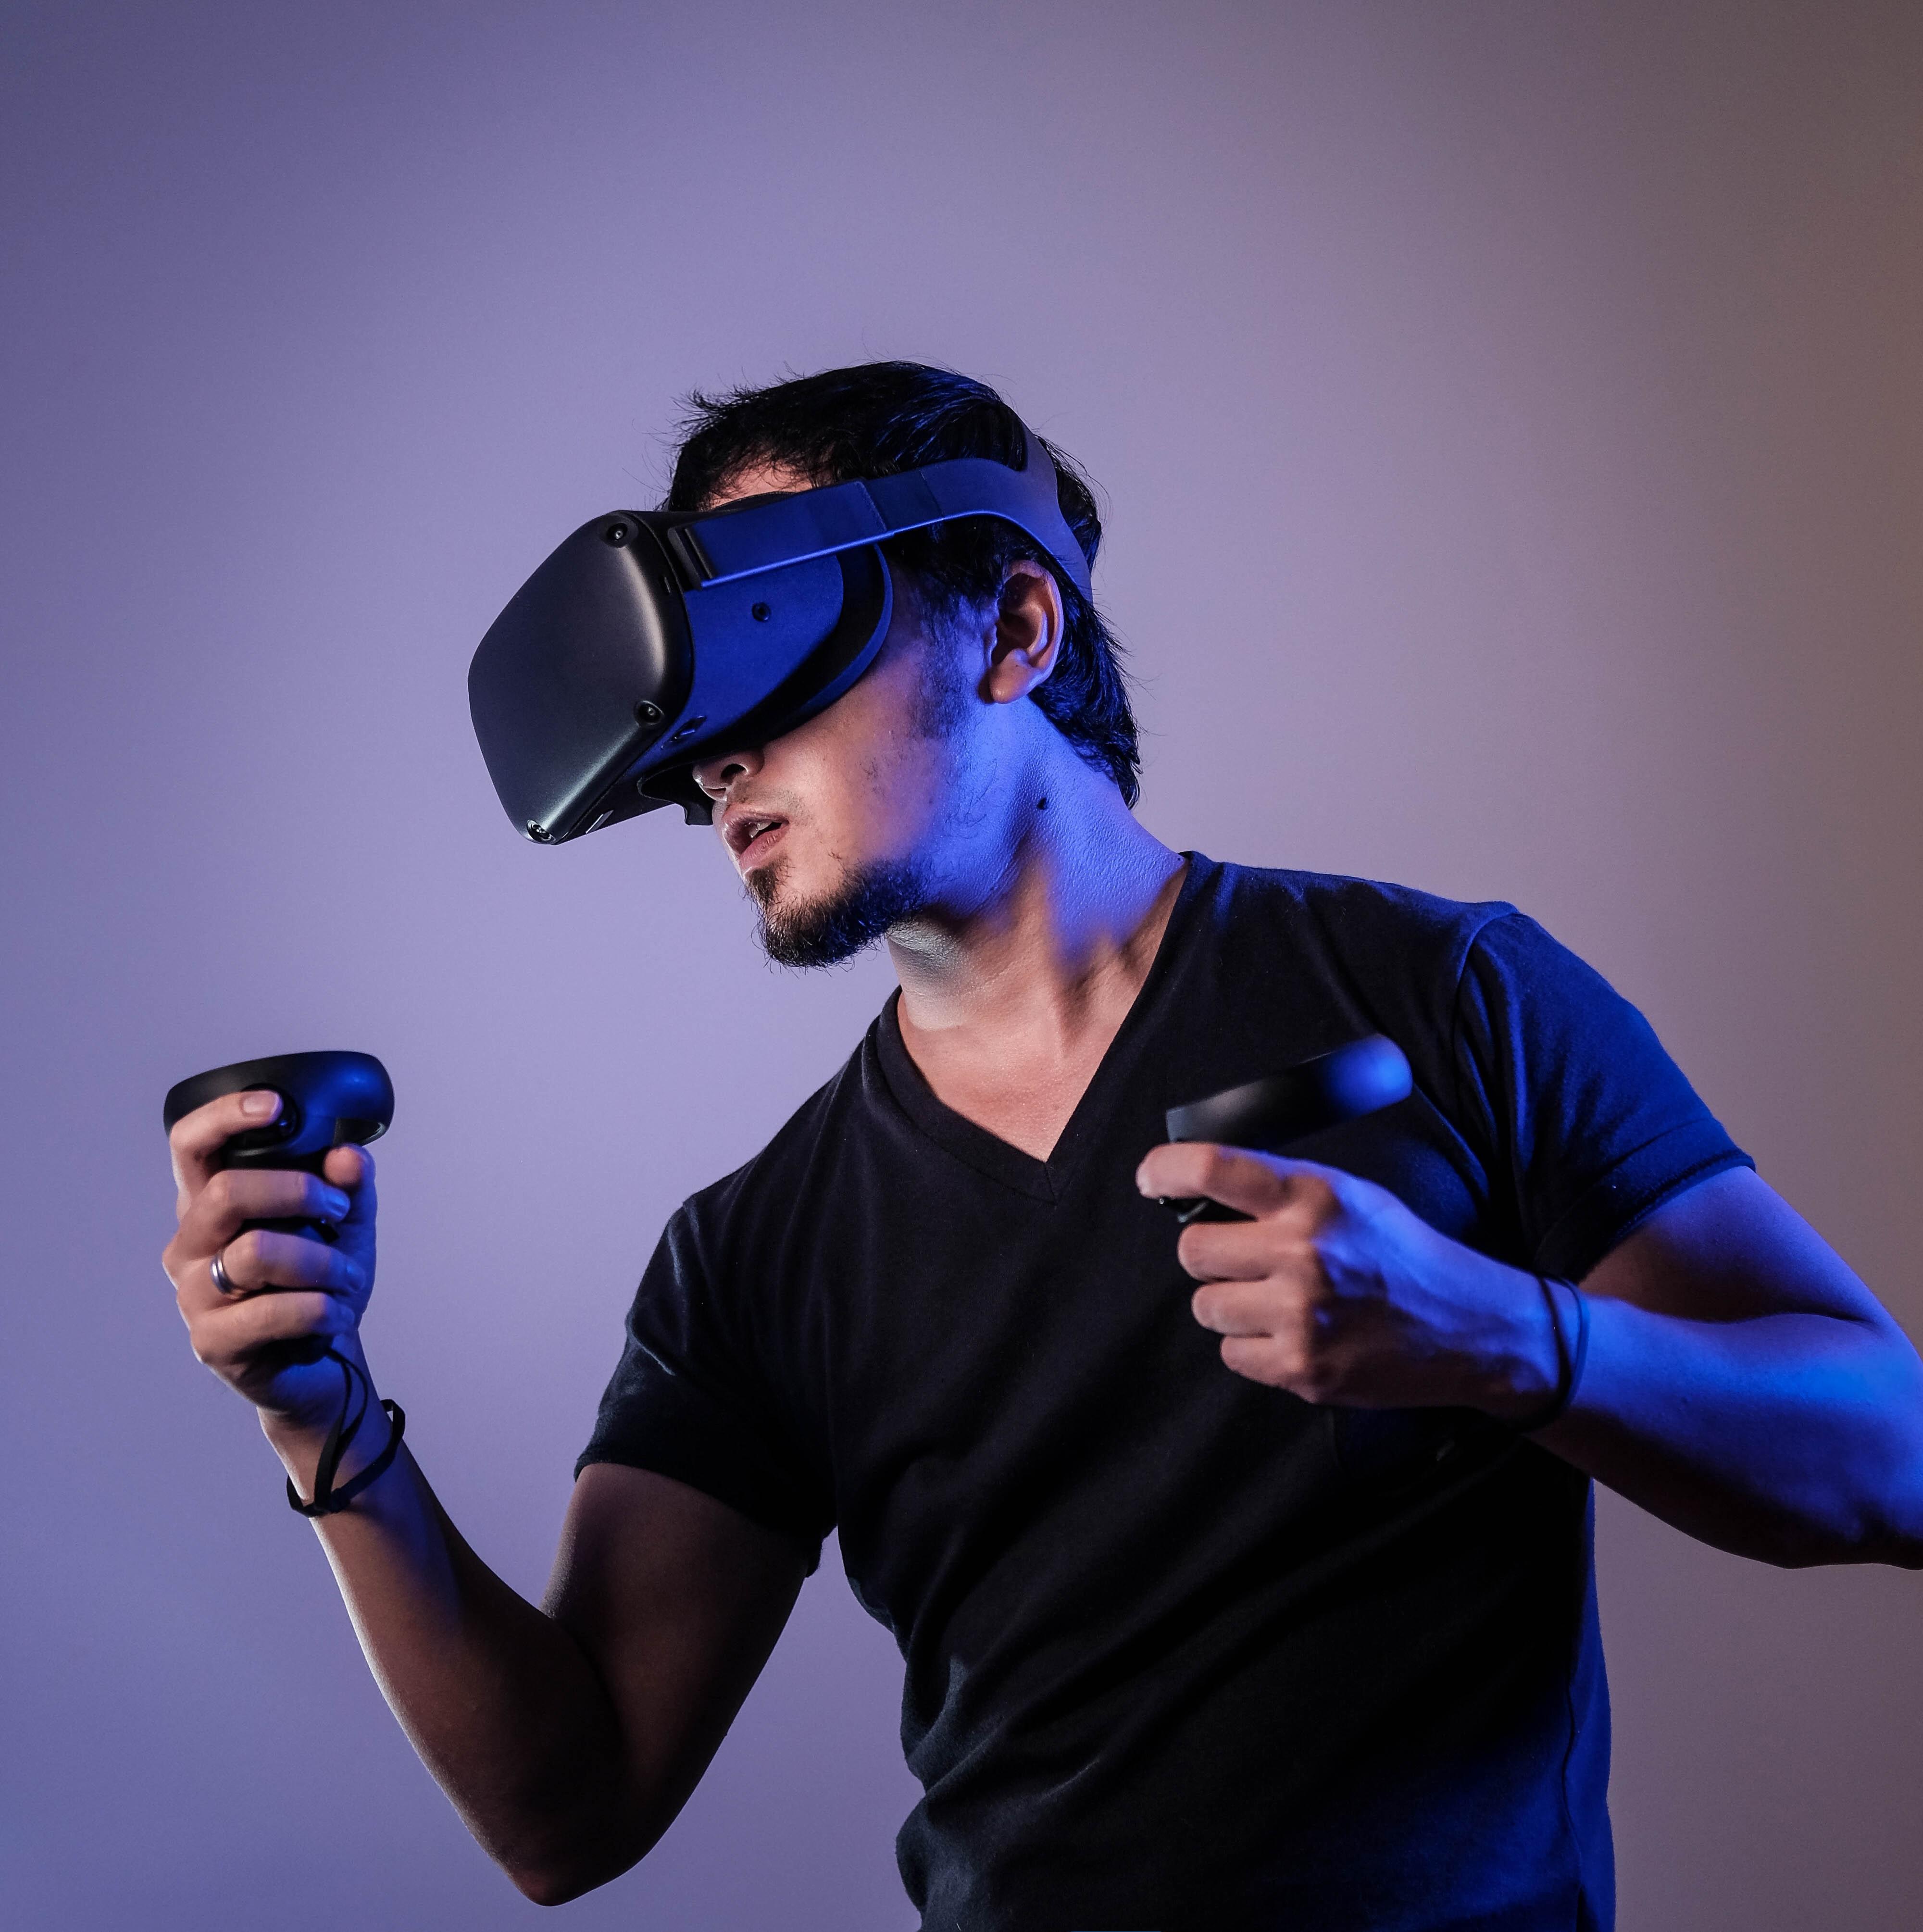 Best Oculus games 2021